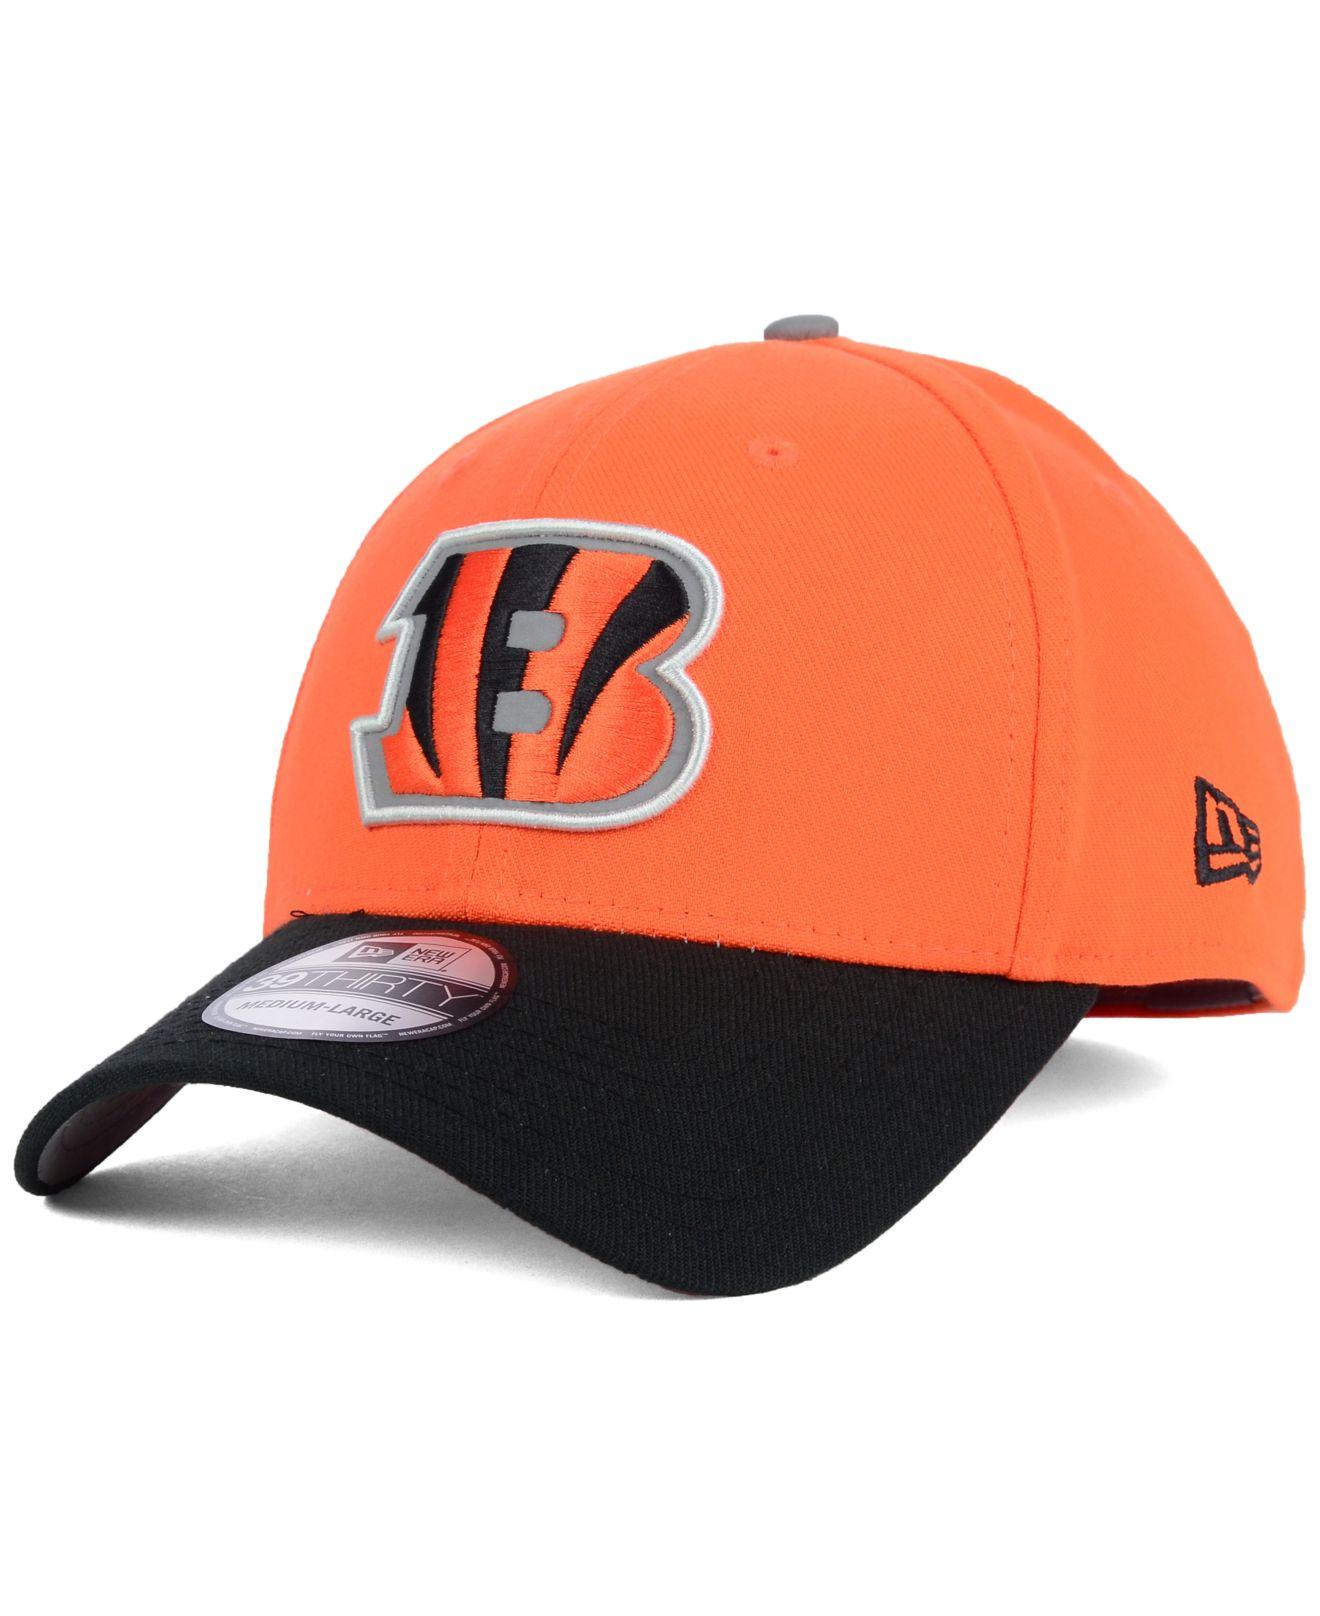 new style 141c9 15866 Lyst - KTZ Cincinnati Bengals On Field Reflective 39Thirty Cap in ...